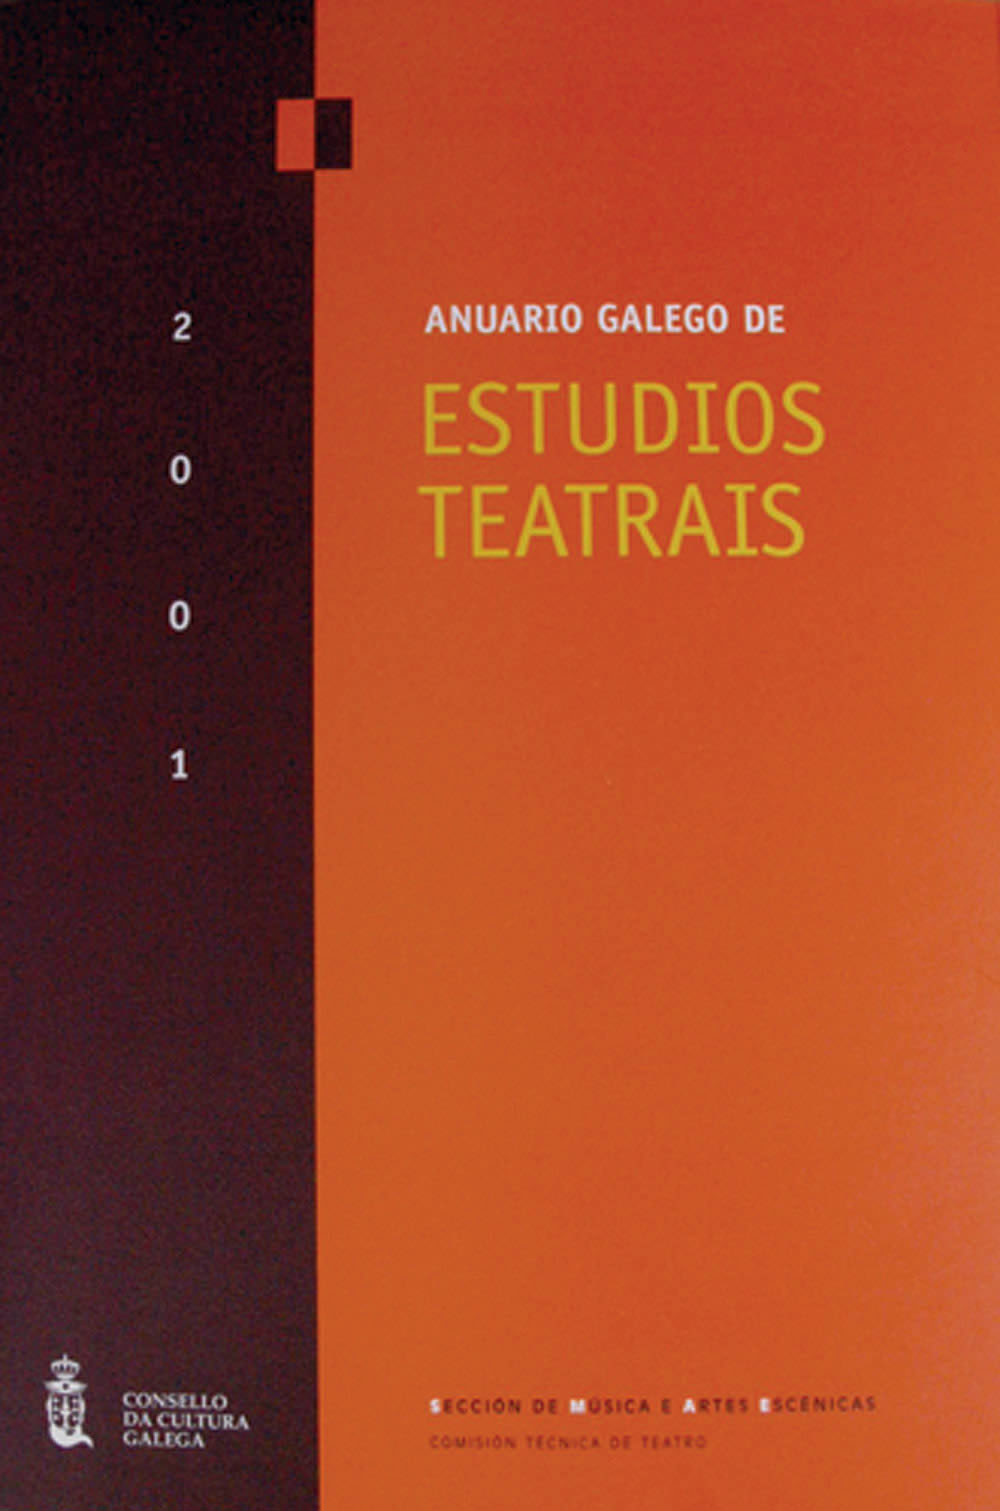 Portada de  Anuario Galego de Estudios Teatrais 2001. N.º 0 (2001)